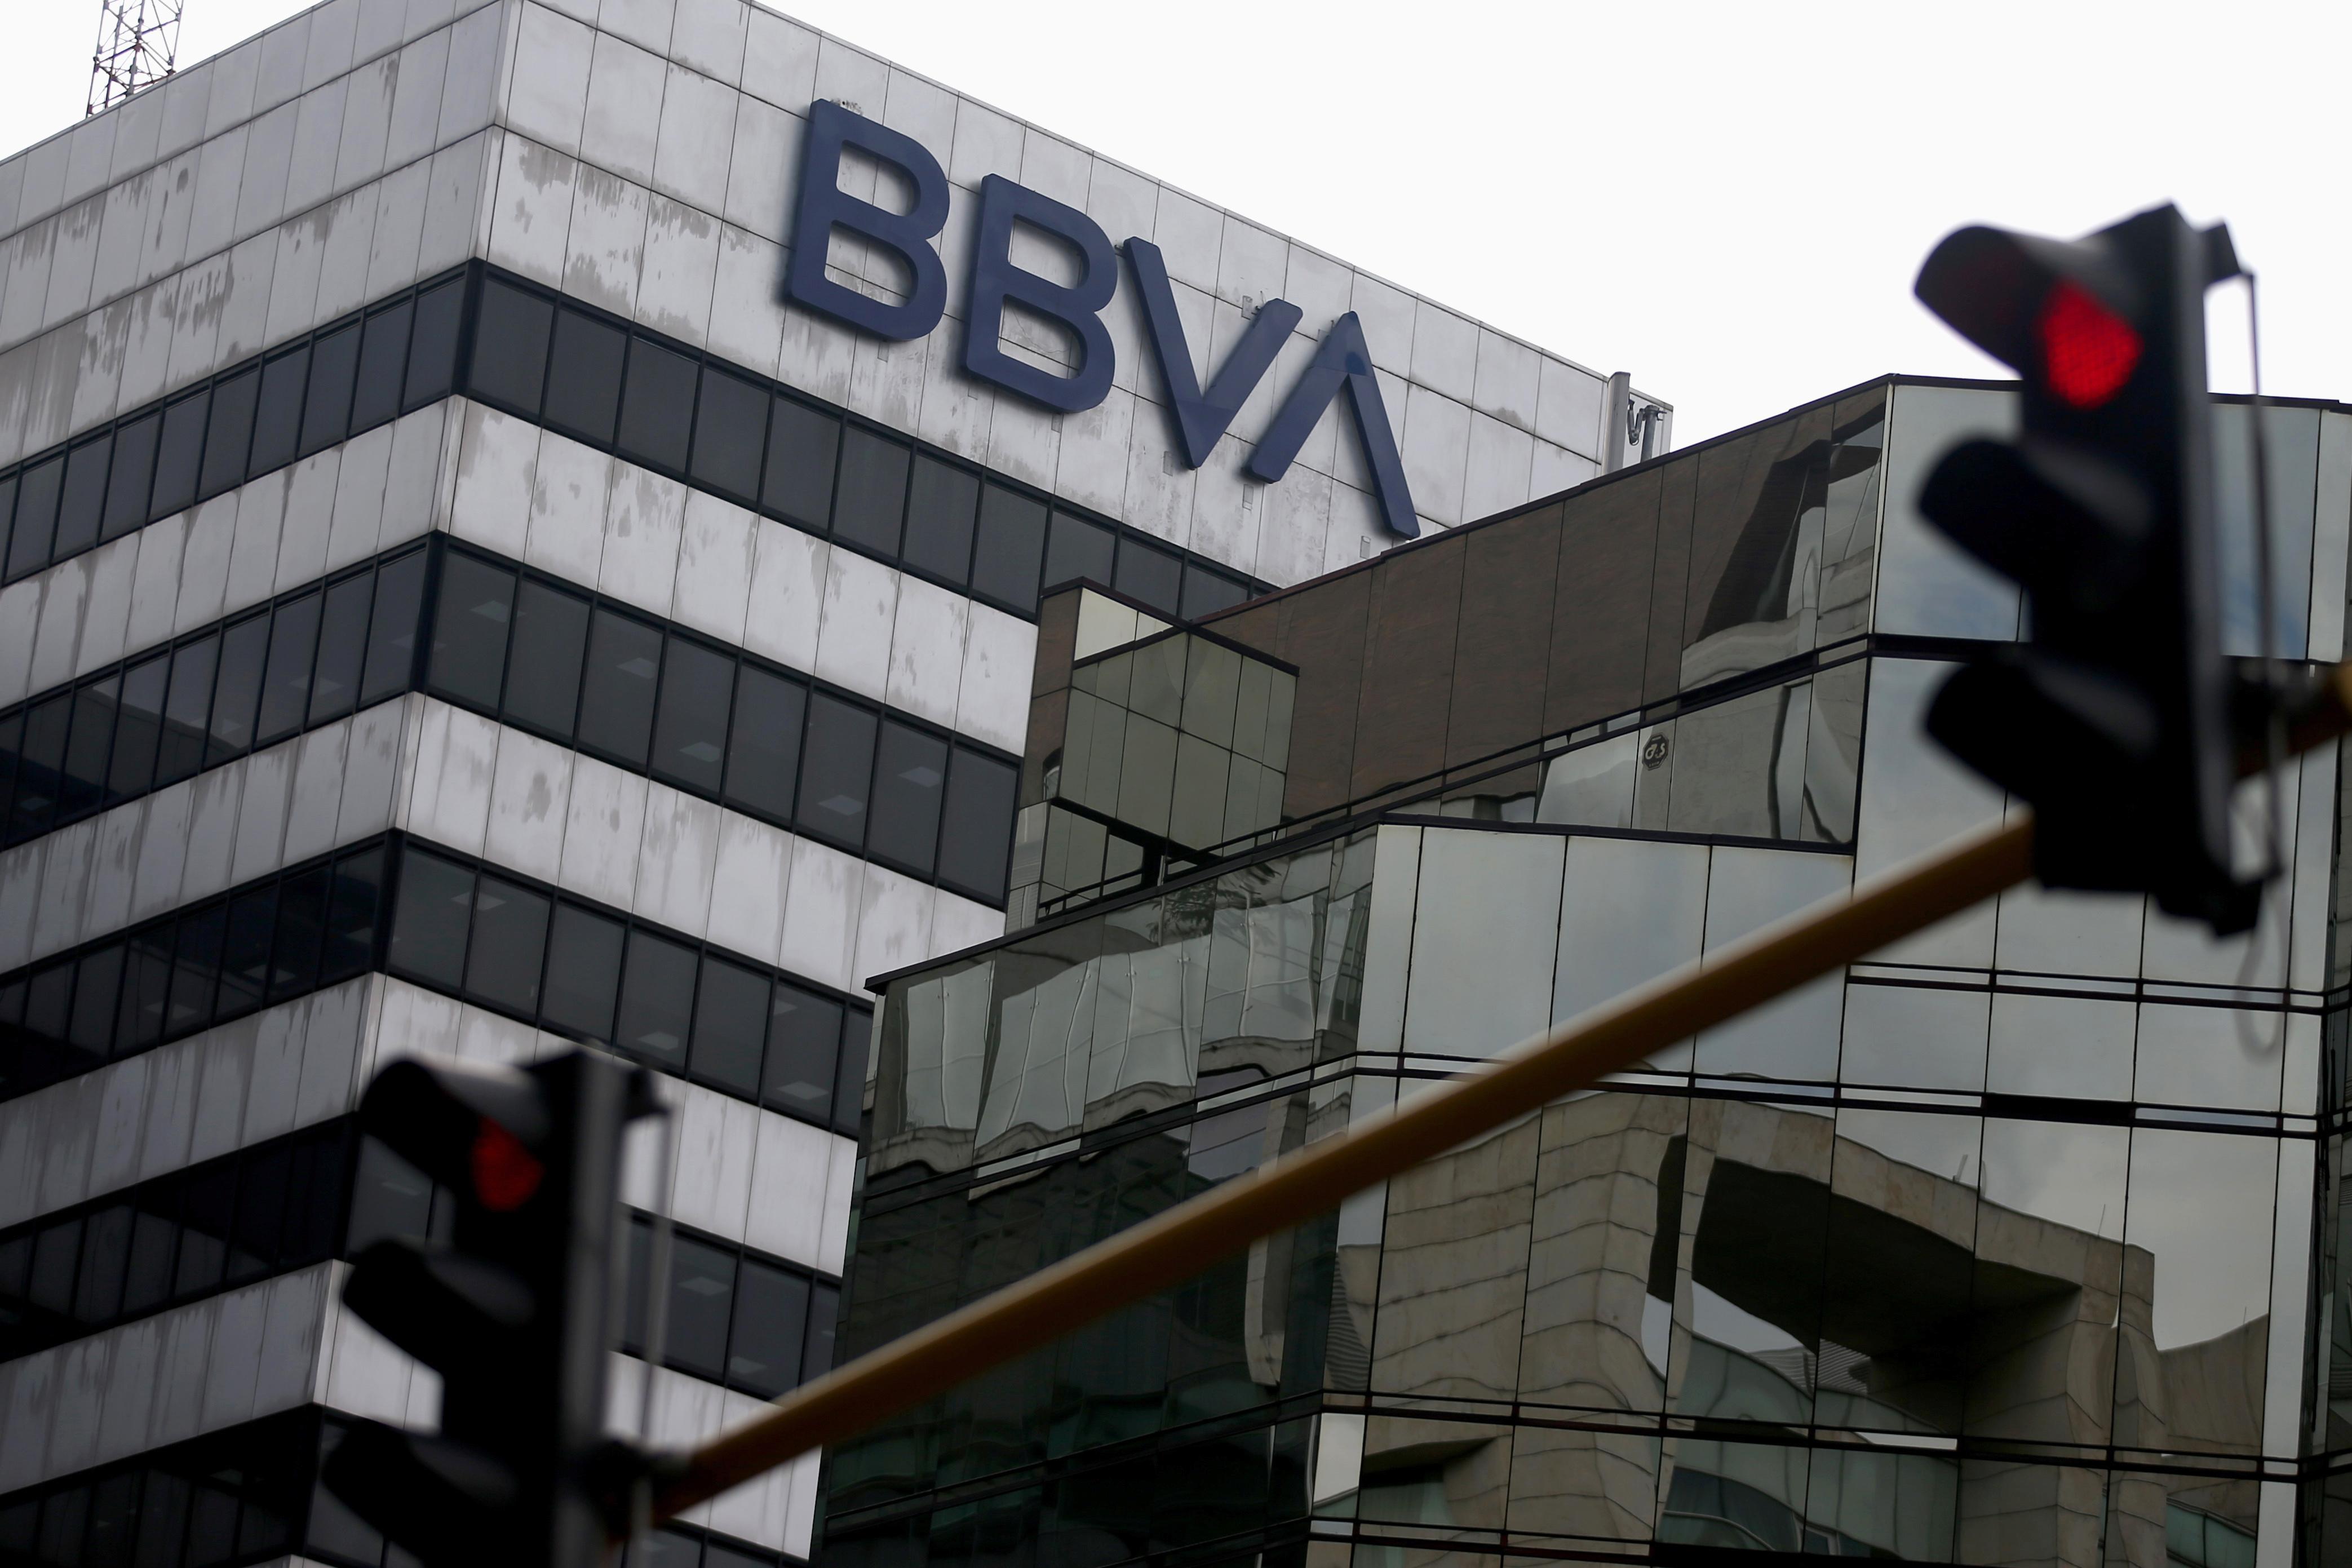 BBVA bank logo is pictured in Bogota, Colombia February 14, 2020. REUTERS/Luisa Gonzalez